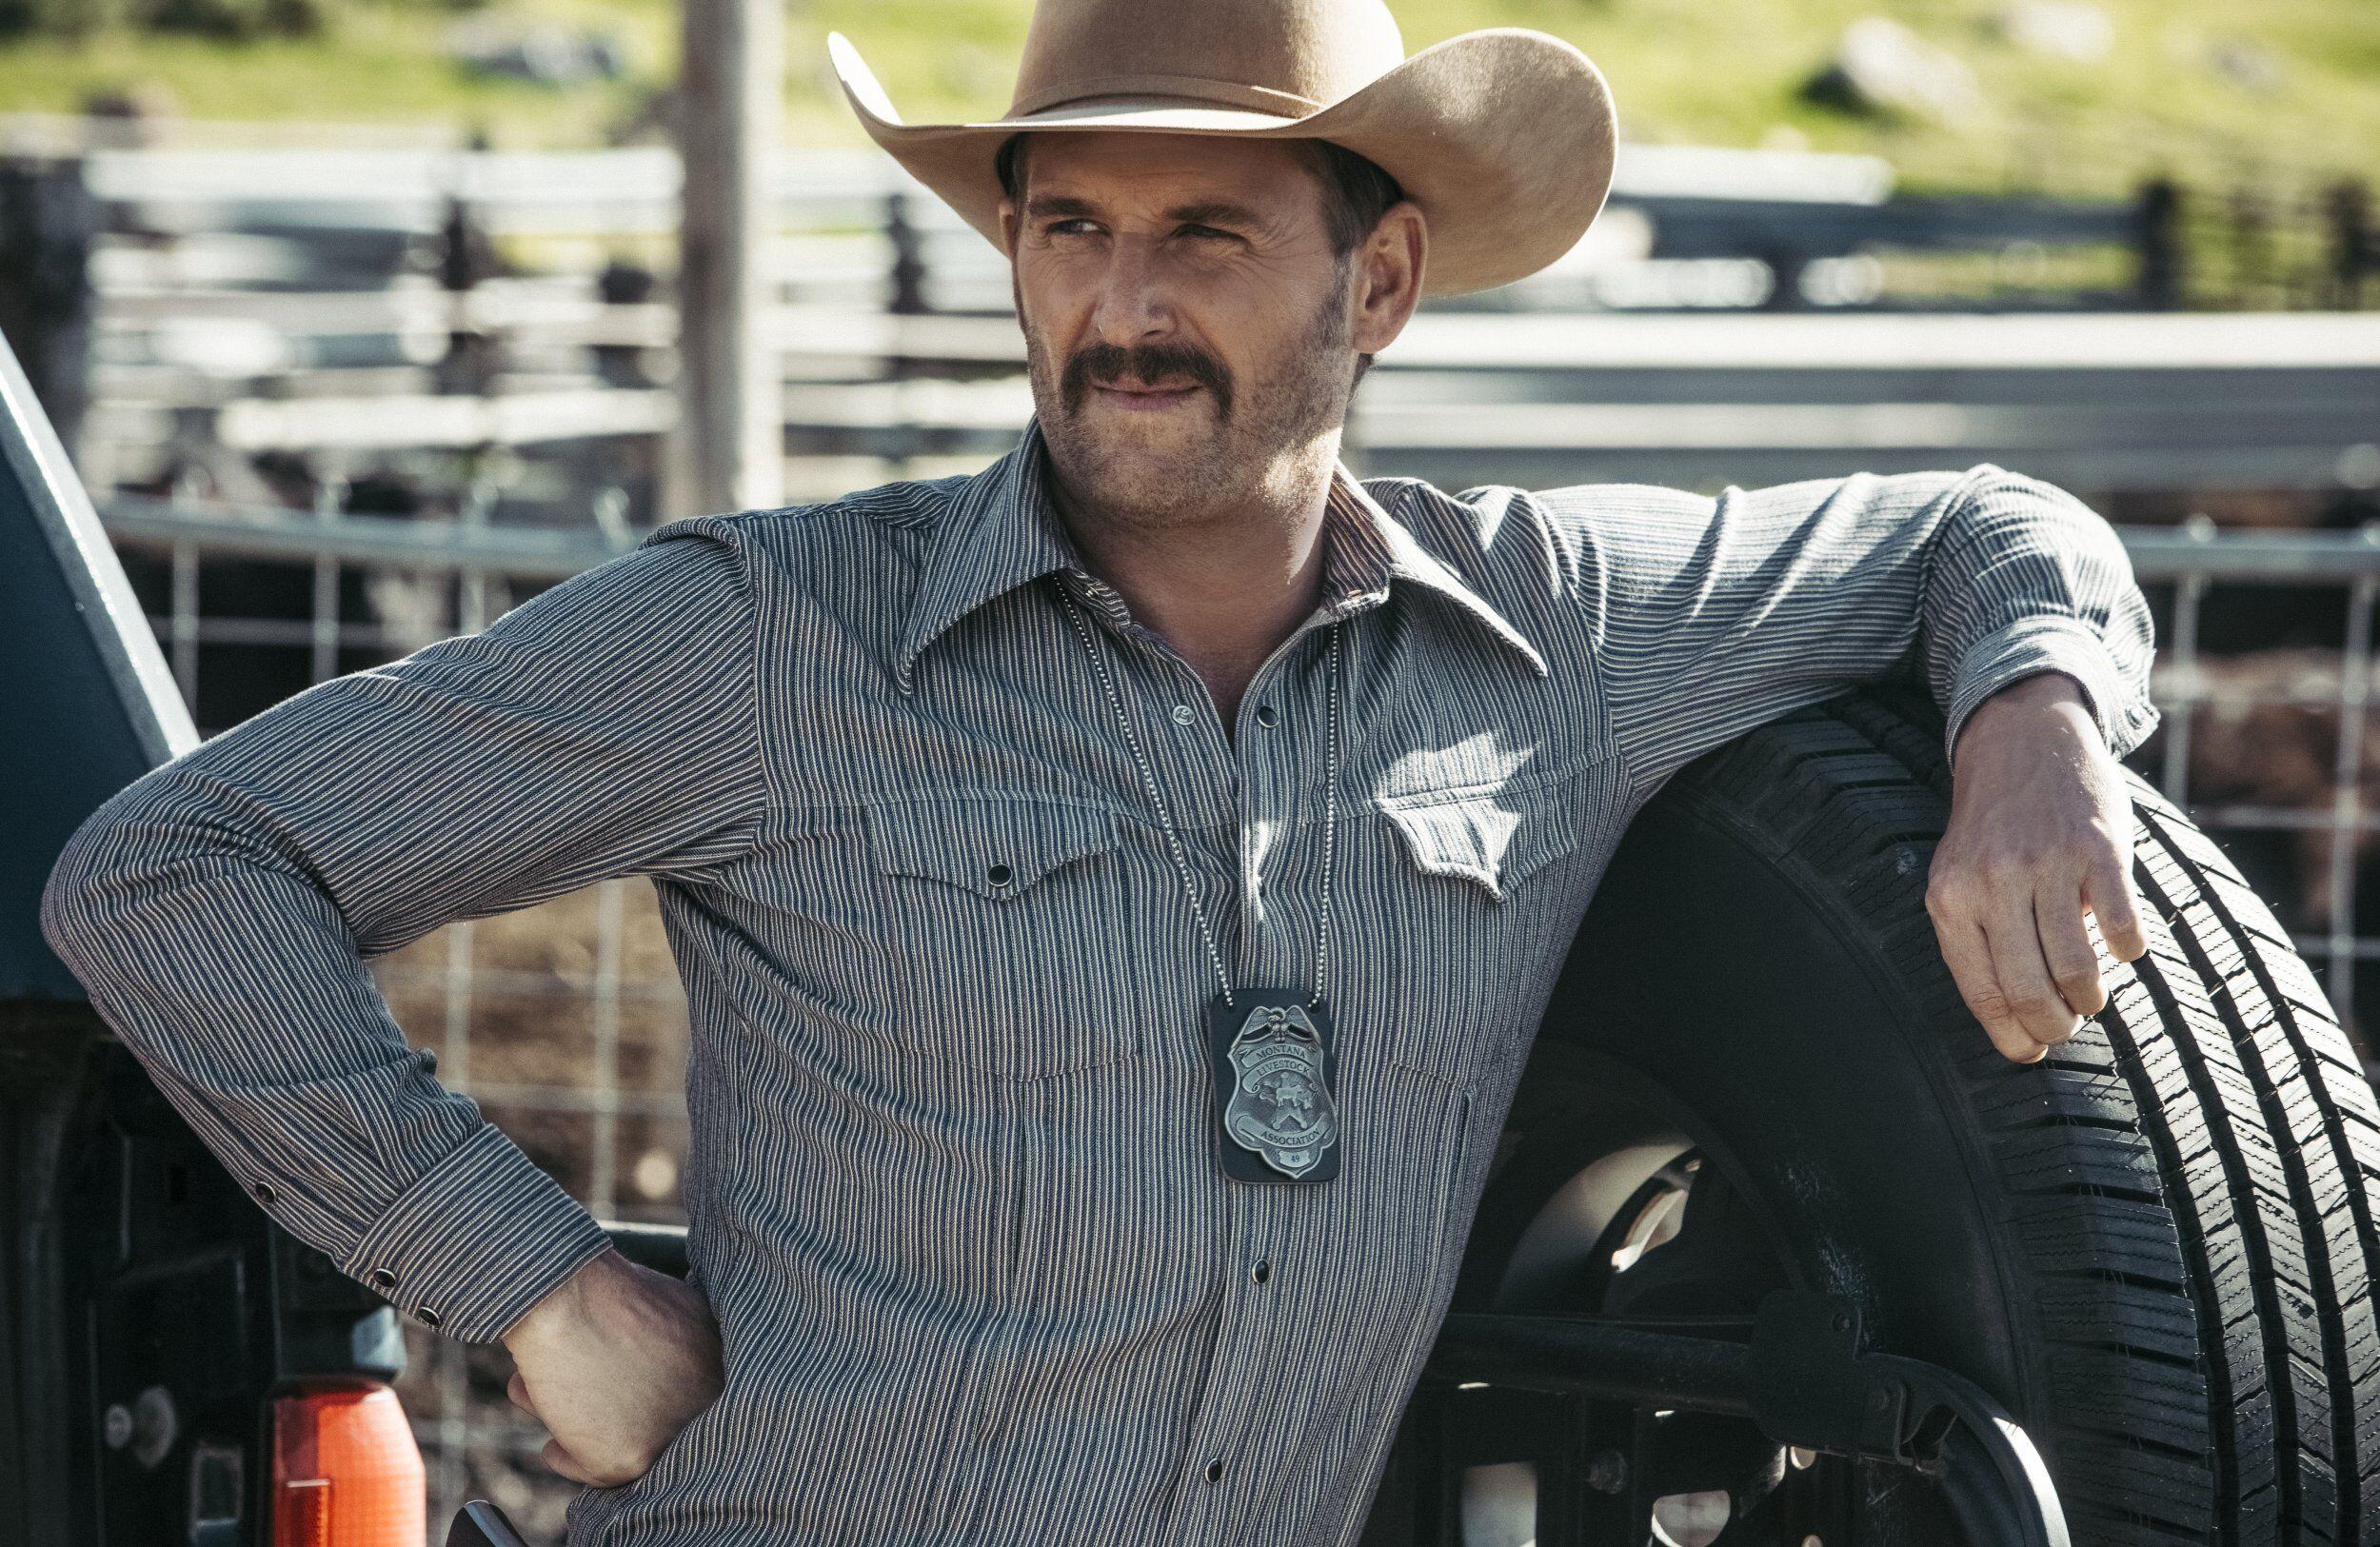 Yellowstone season 1, episode 8 recap: 'The Unraveling, Part 1'